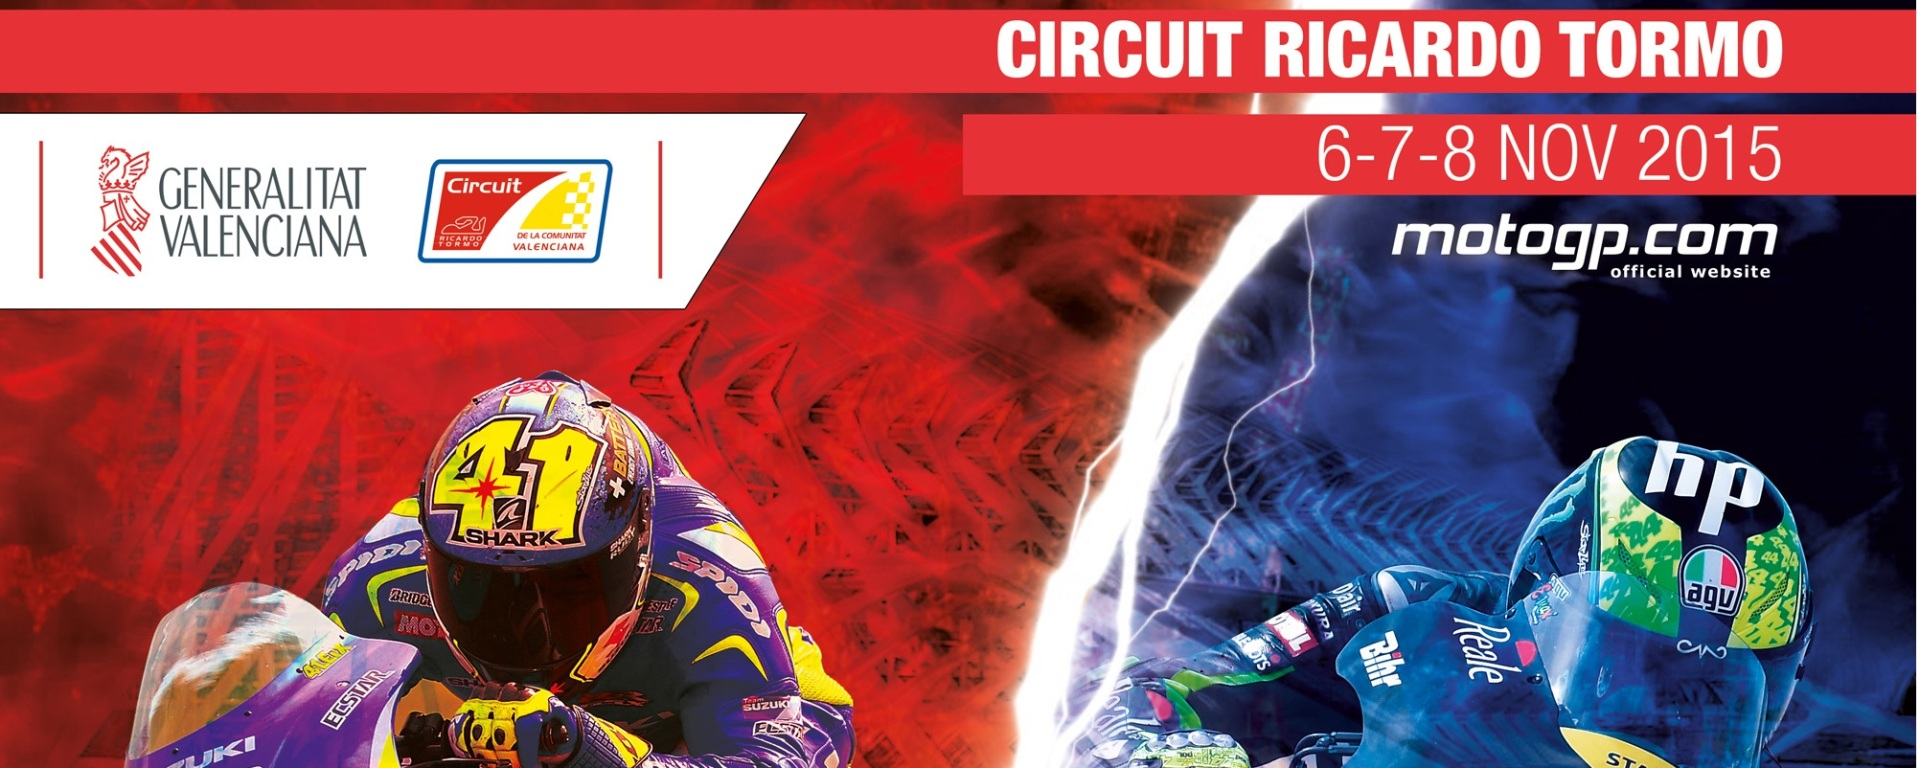 23c02fc185e Previo y horario del Gran Premio Motul de la Comunitat Valenciana ...